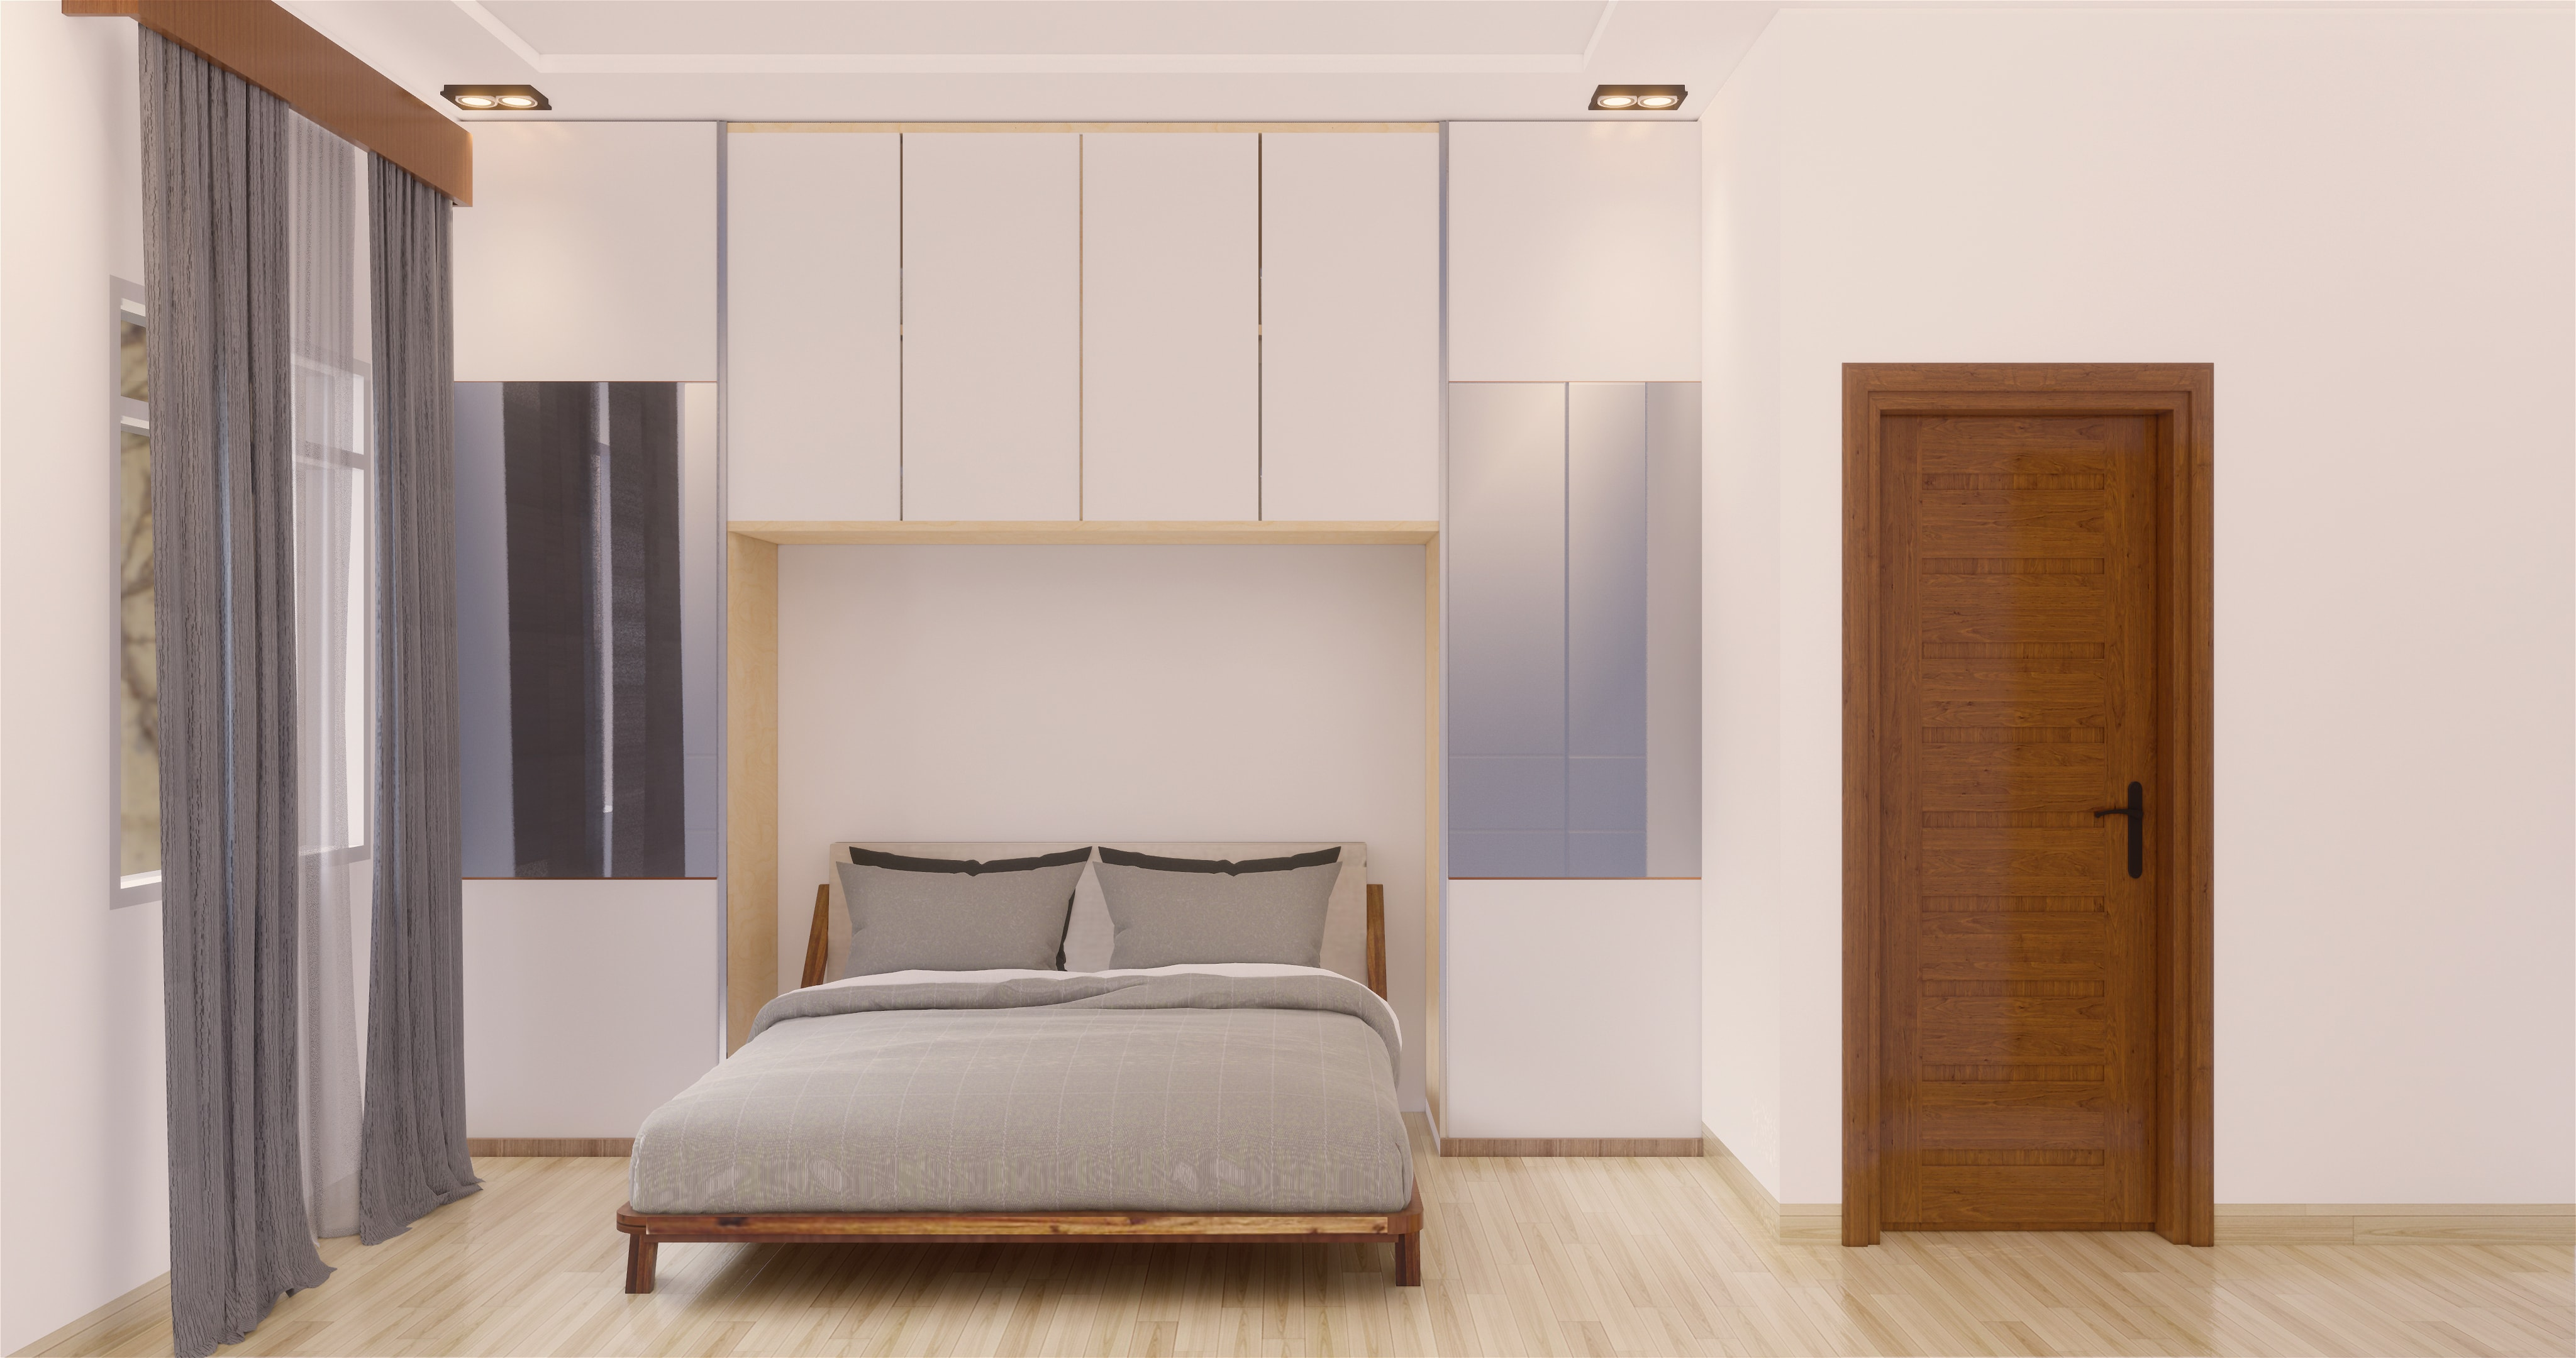 Desain kamr tidur gaya modern industrial